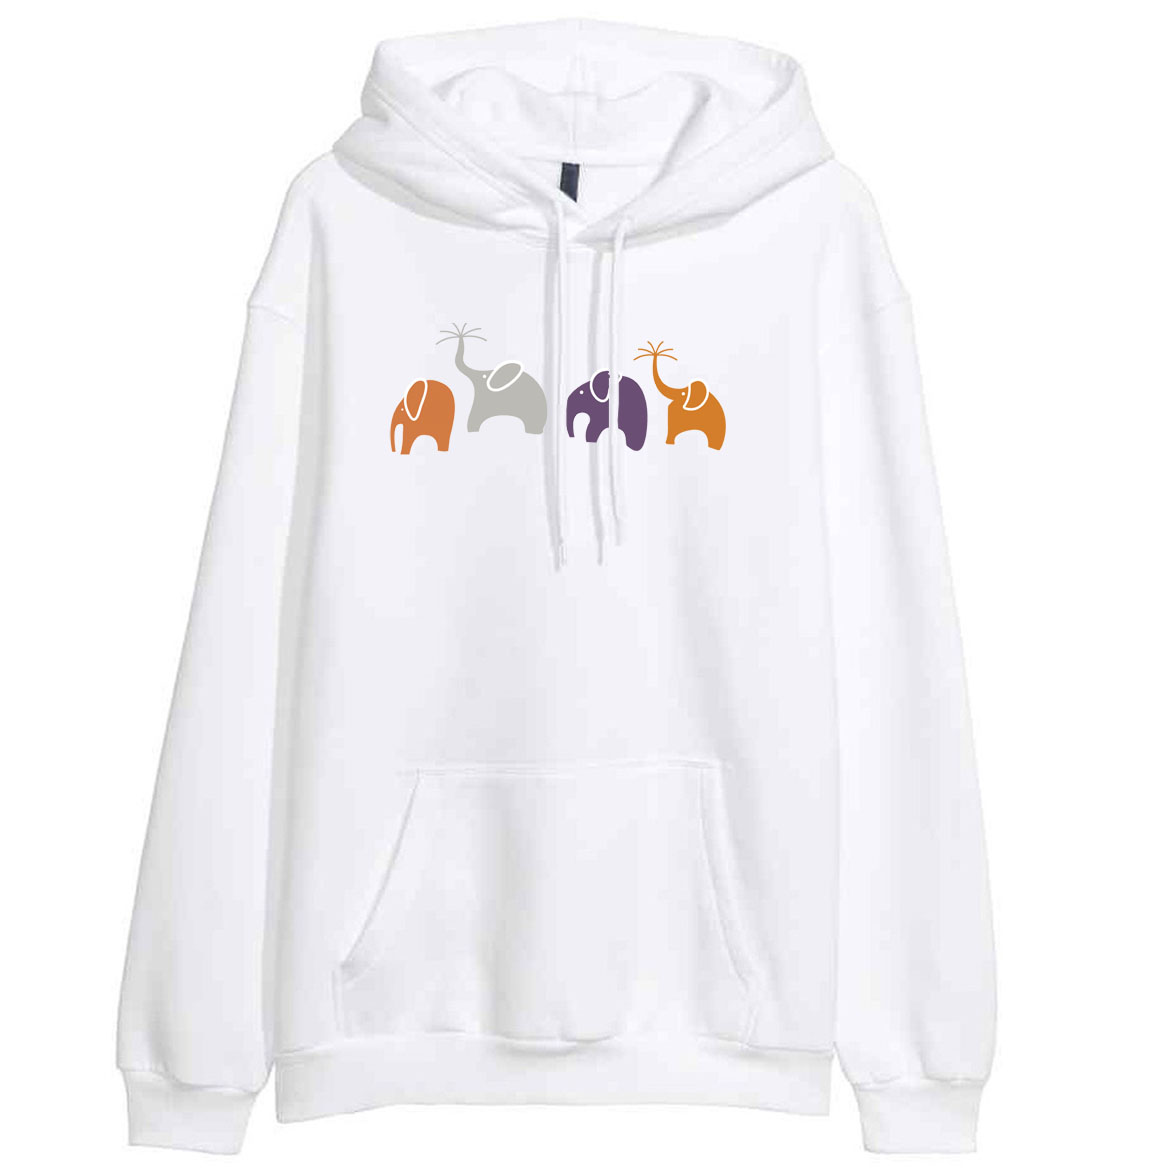 Hoodies 2019 Spring Winter Fleece Sweatshirt Brand Clothing Fashion Hip Hop Animal Elephant Cartoon Print Kawaii Crossfit Hoody